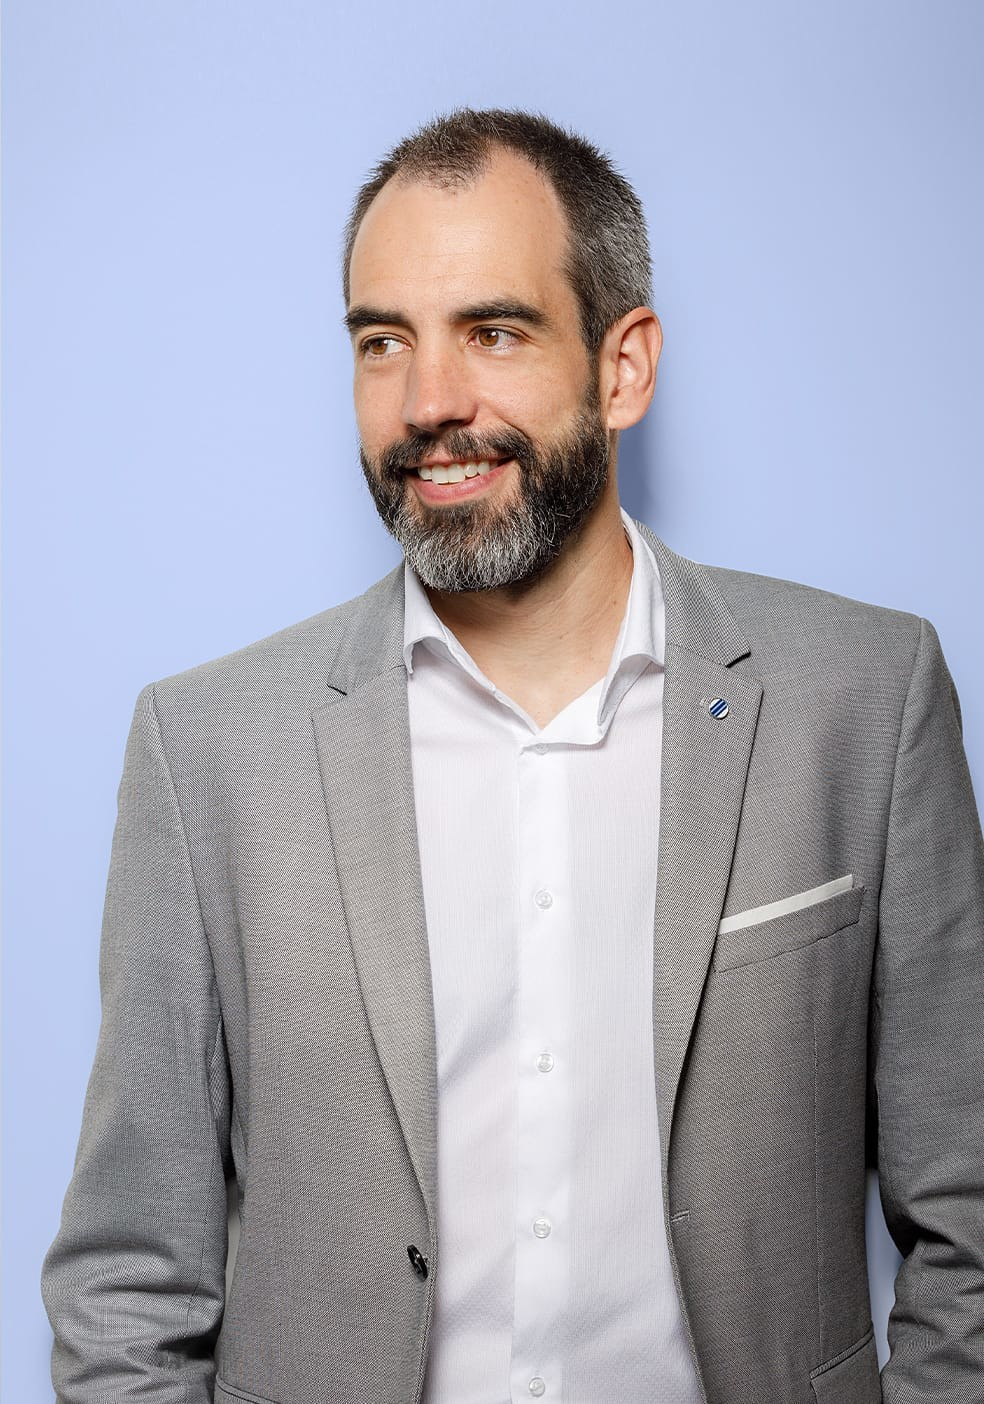 Jon Intxausti